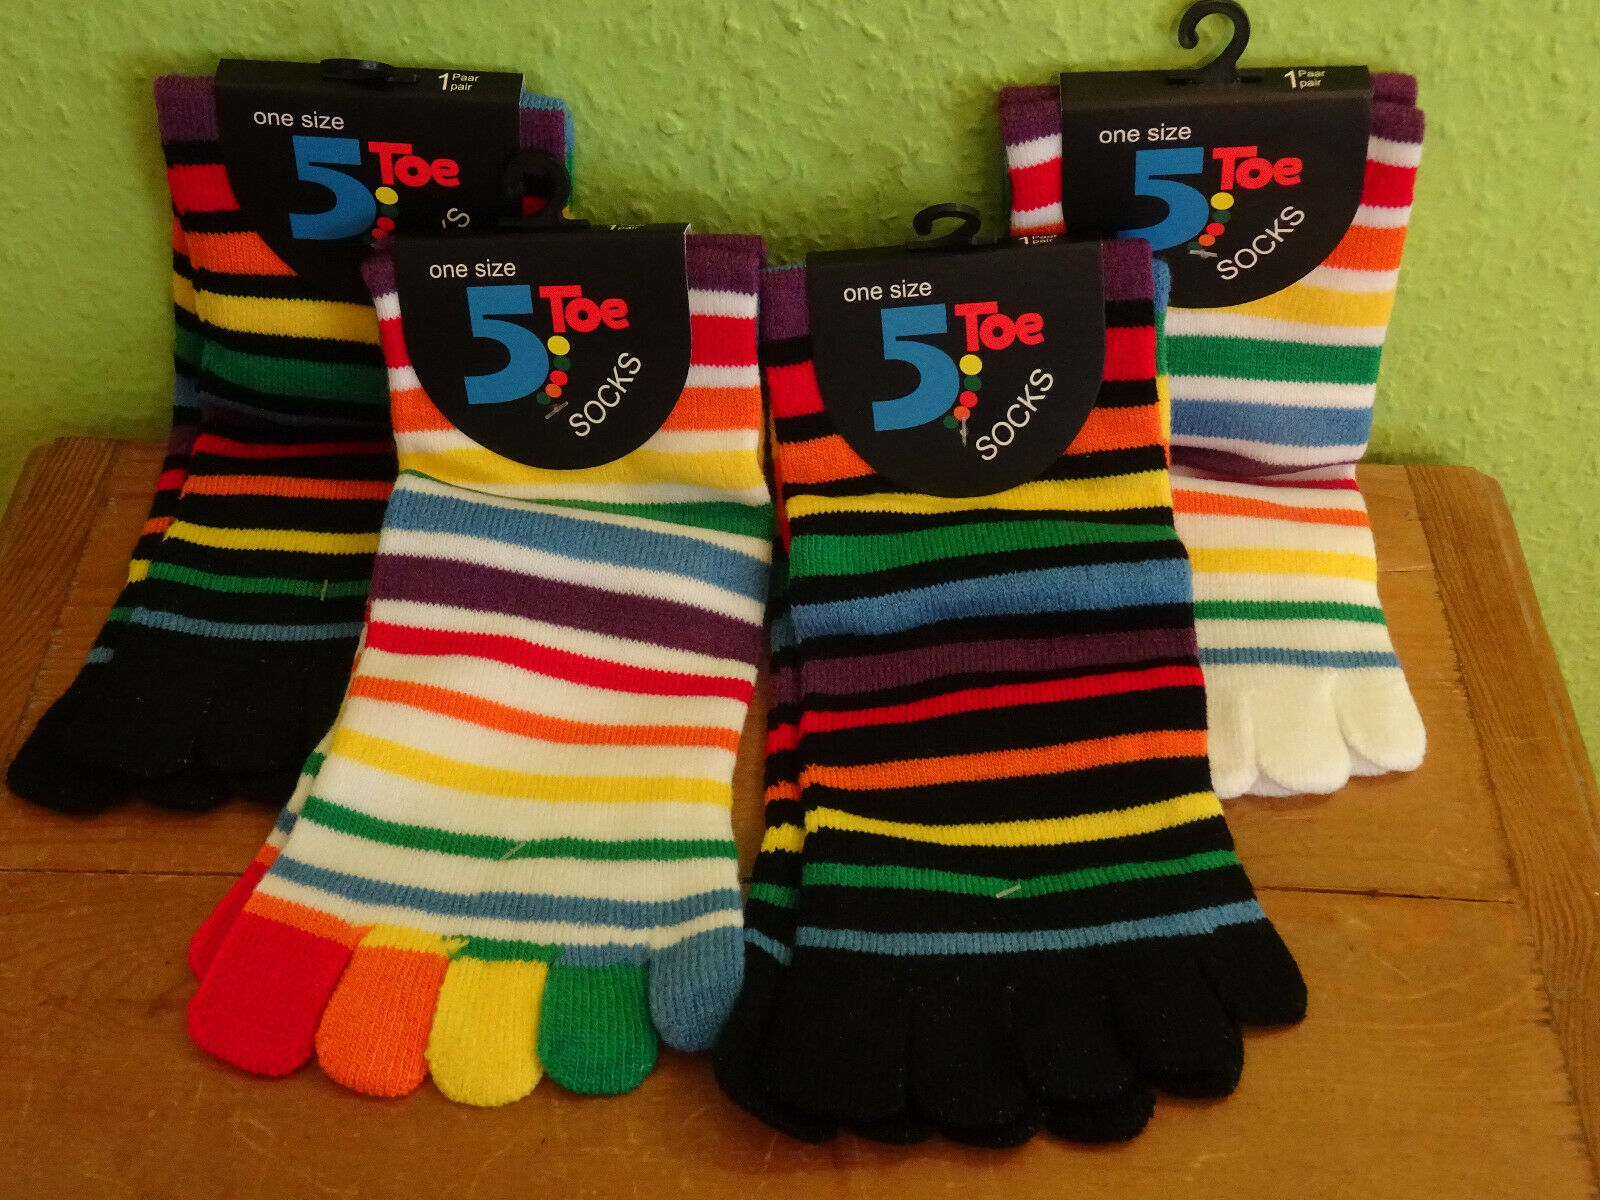 2 Paar Damen bunte Ringel Zehensocken Streifen Socken 5 Einzelzehen Kurz neu